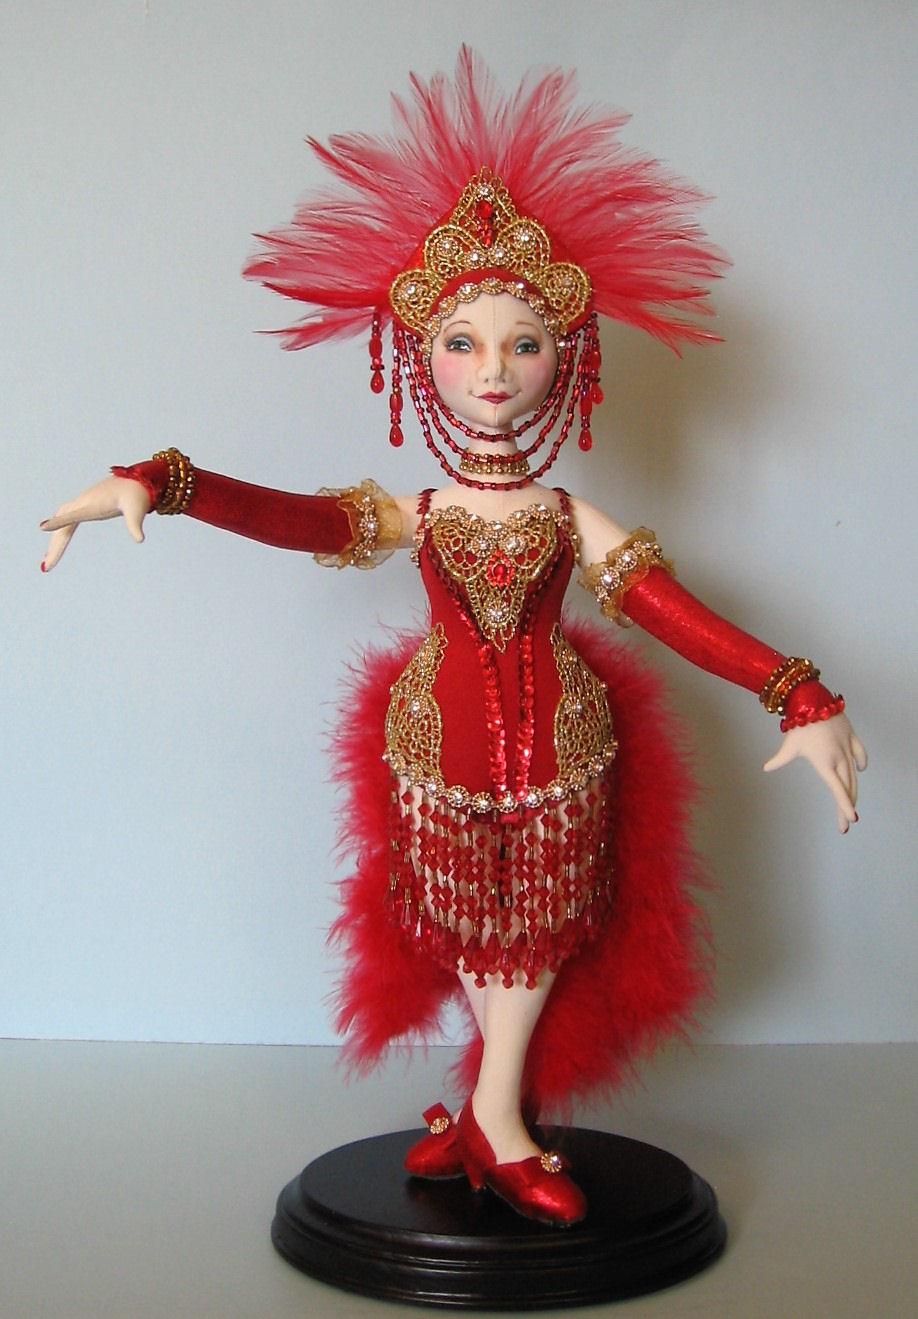 "SANTOS CAGE DOLL/"" BY ARLEY BERRYHILL *NEW* CLOTH ART DOLL PATTERN /""ISABELLA"